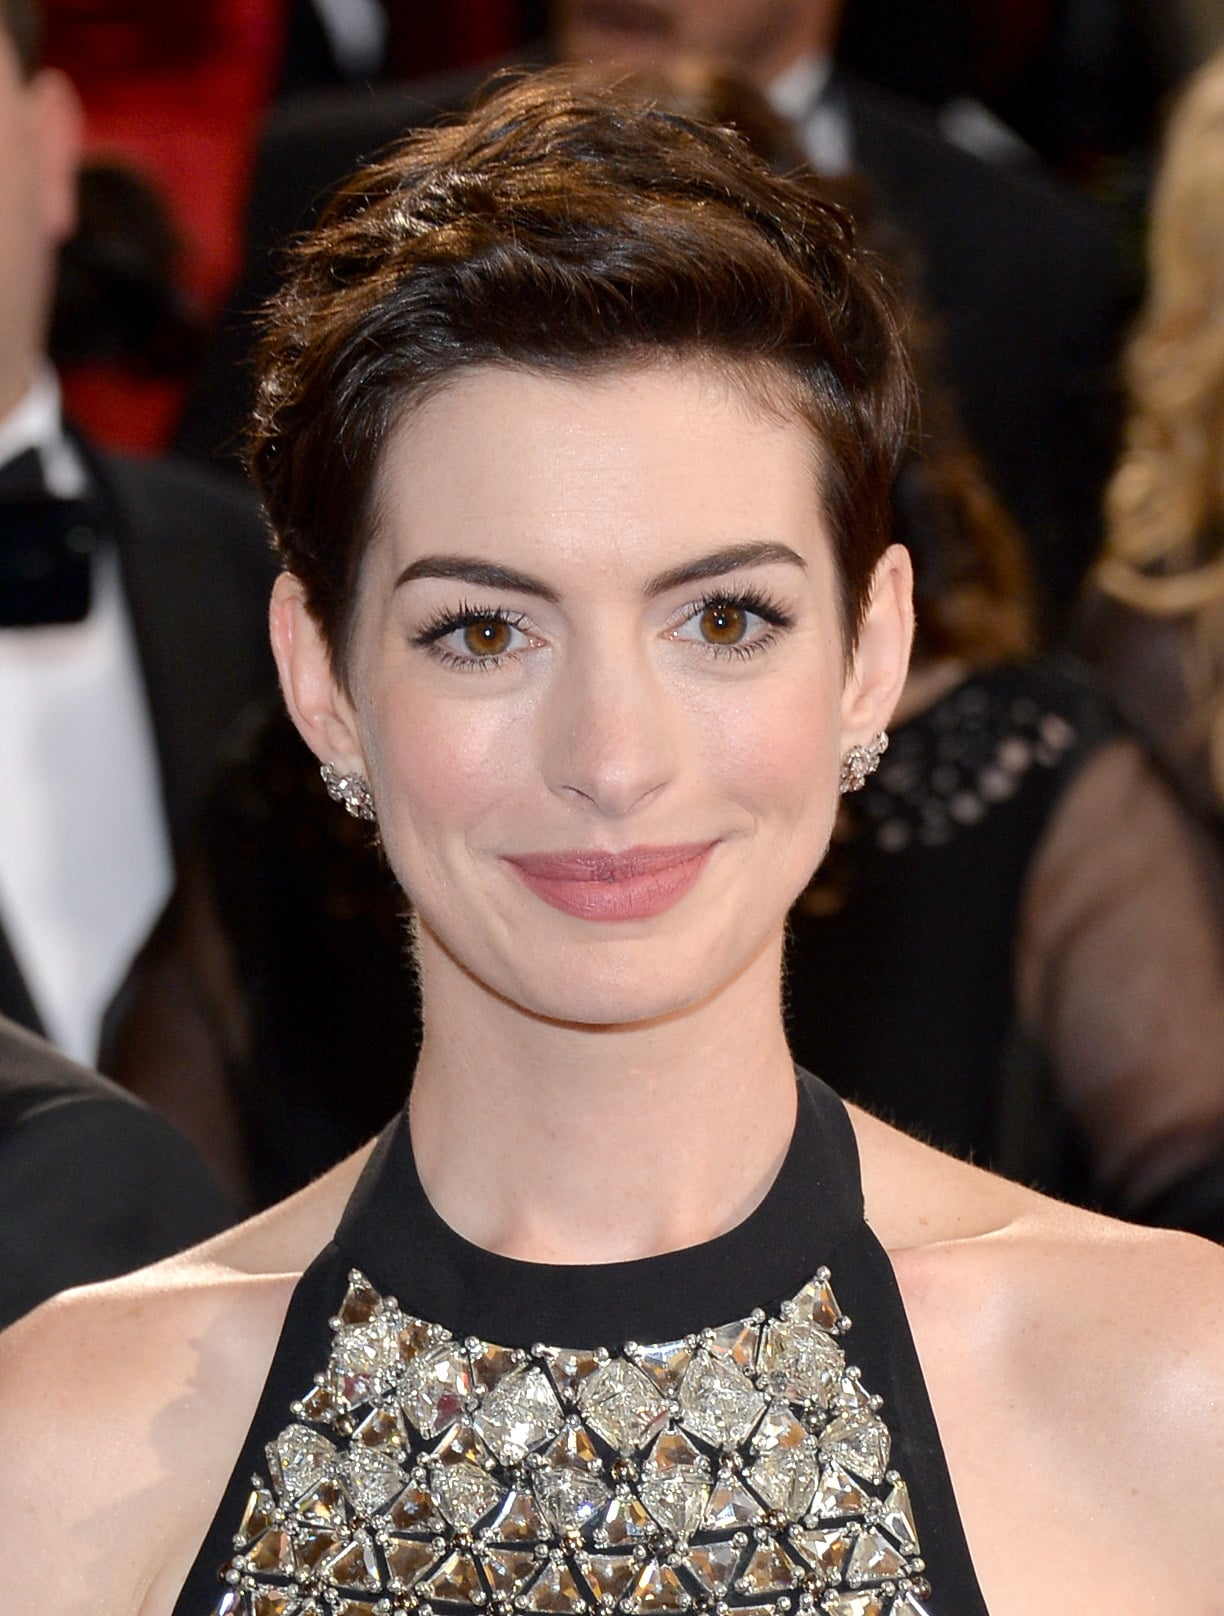 Anne Hathaway at 2014 Oscars